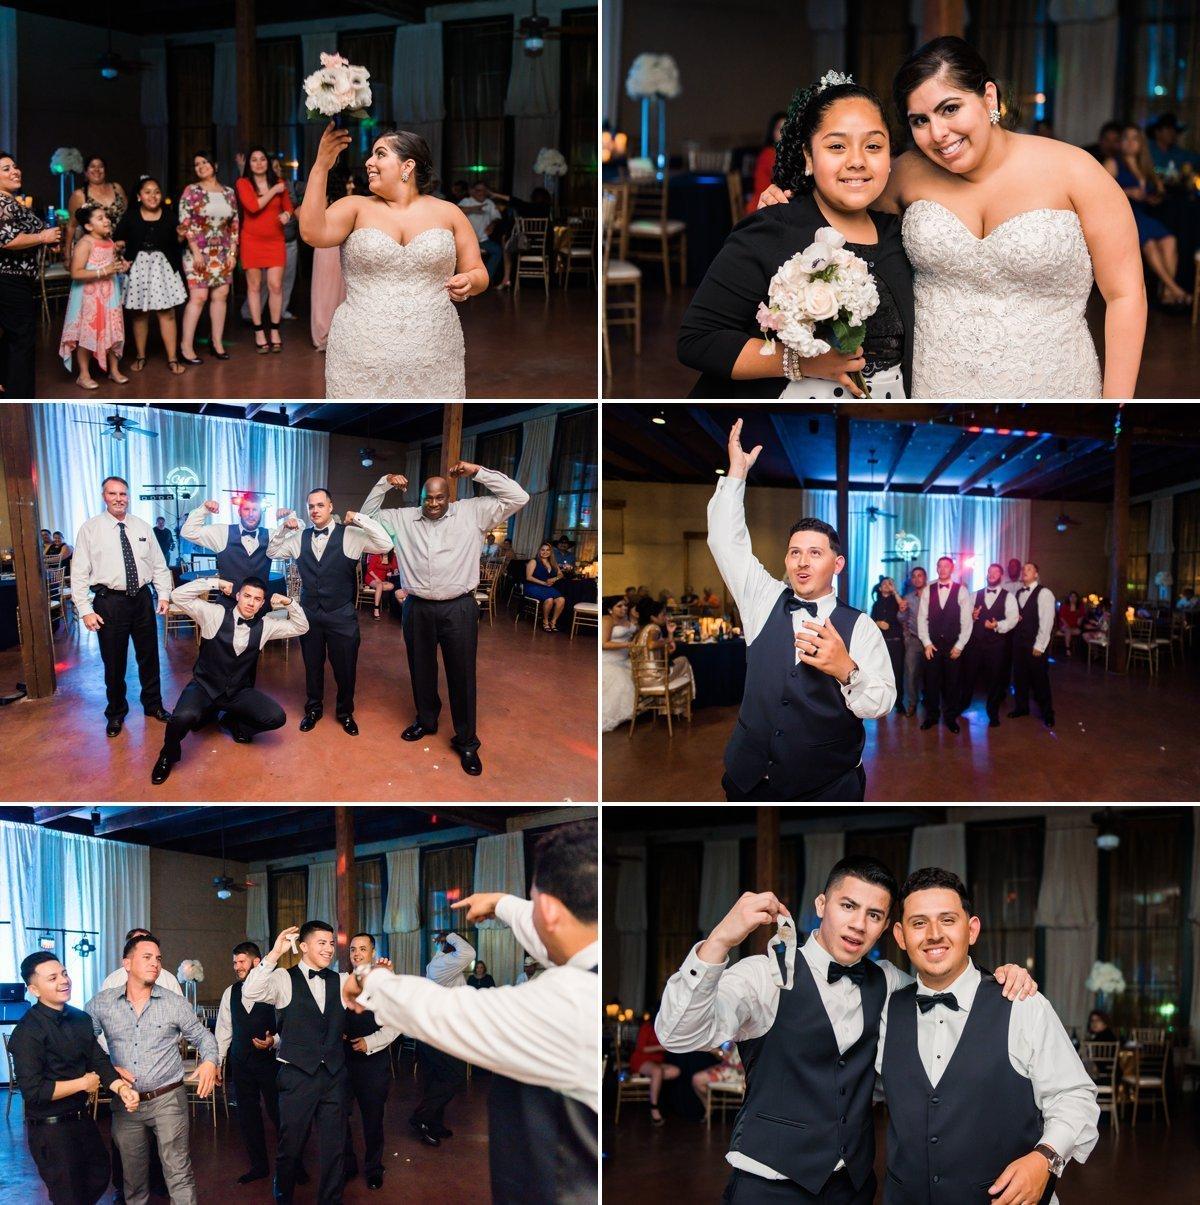 Monica-JJ Wedding 88